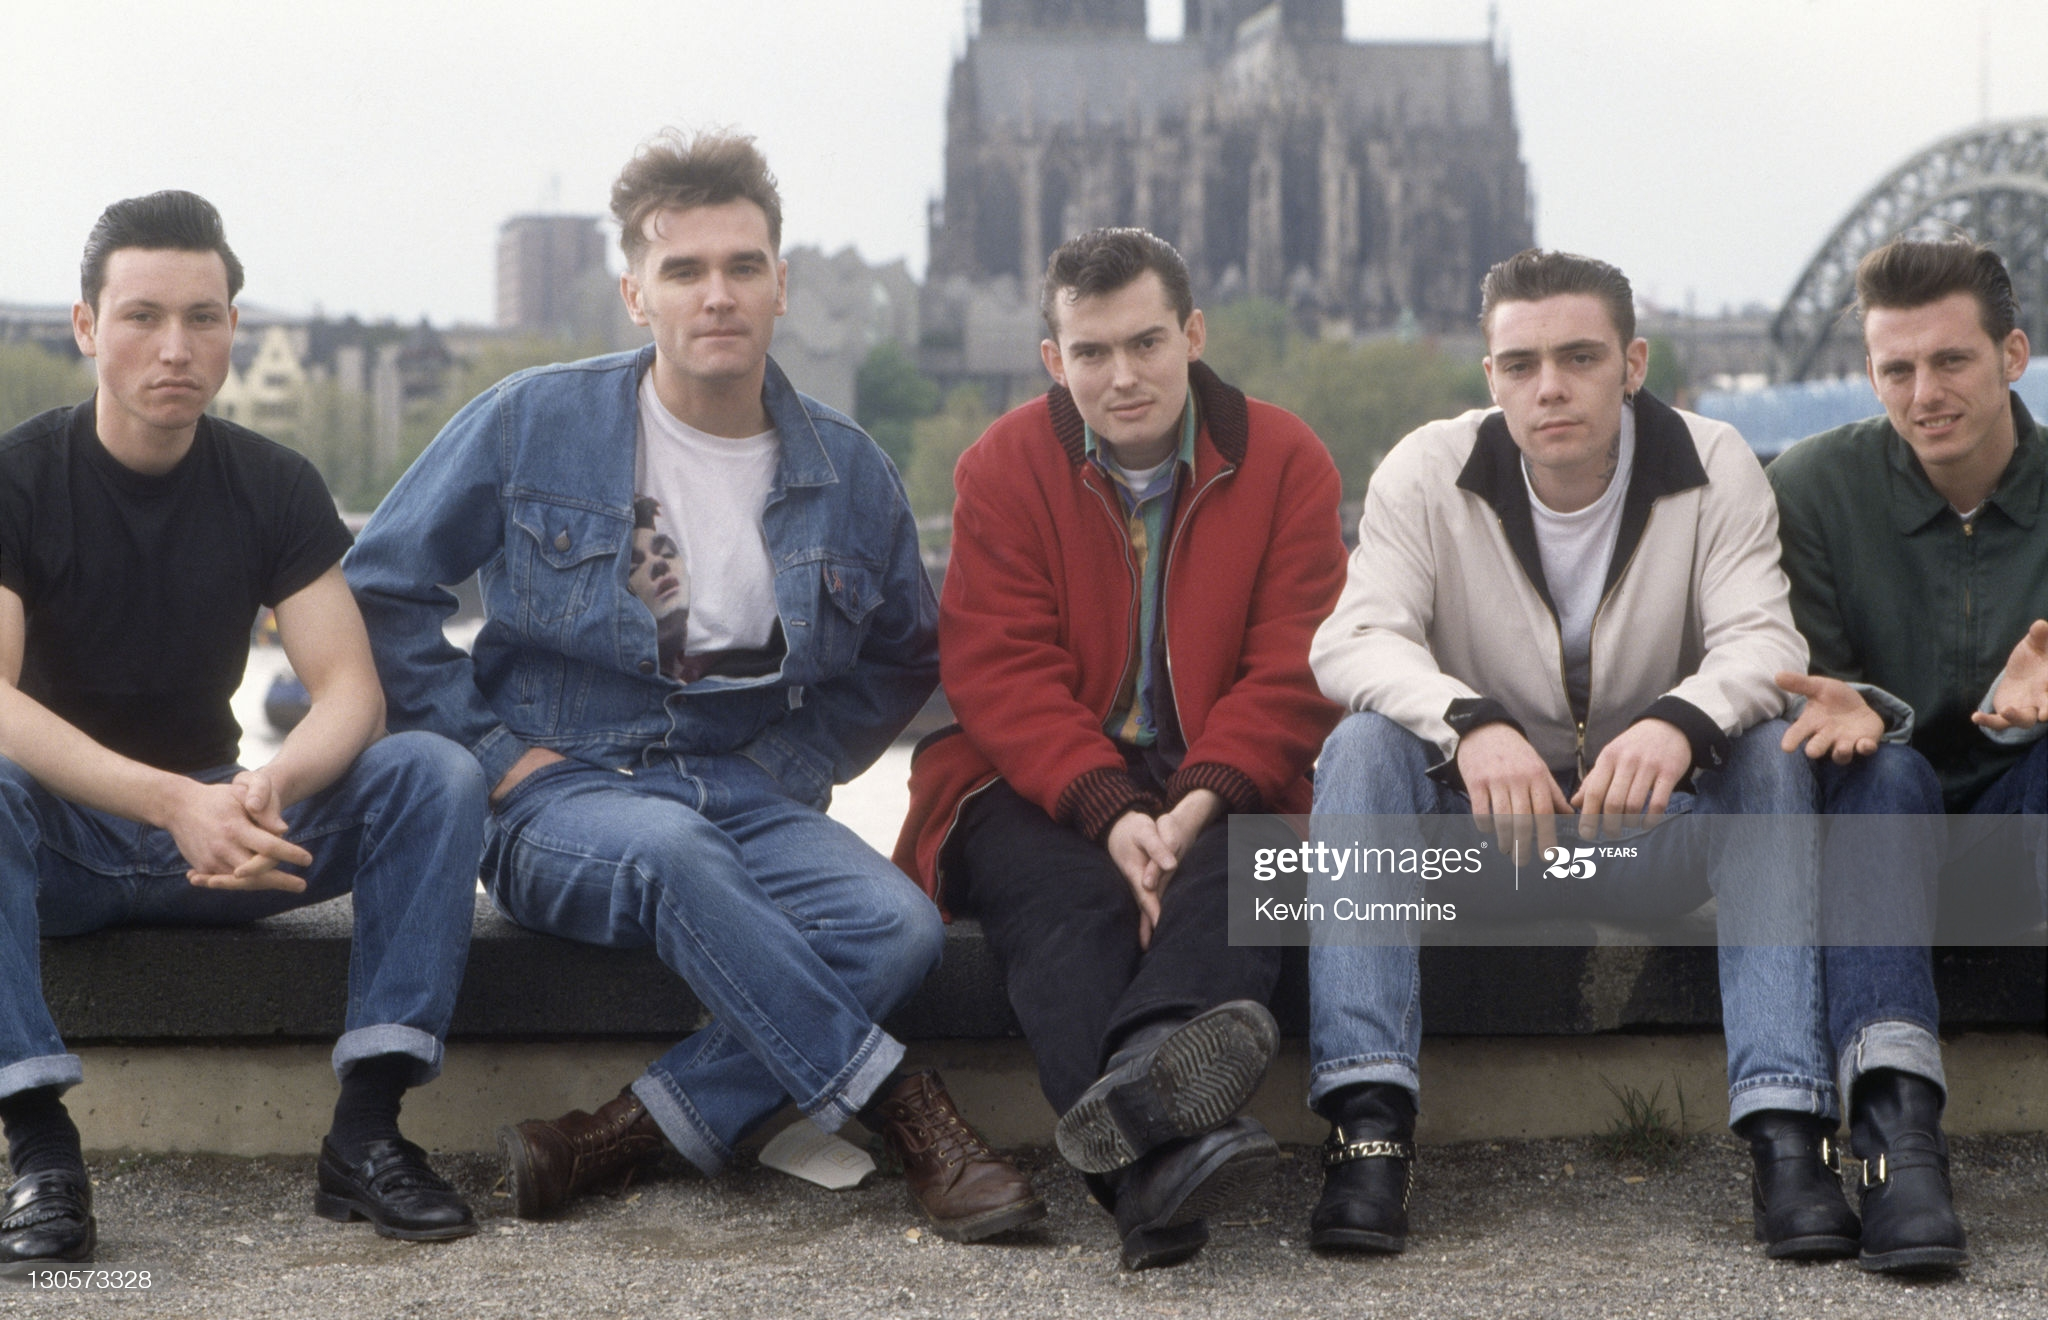 Morrissey Koln 1st May 1991 Kevin Cummins.jpg